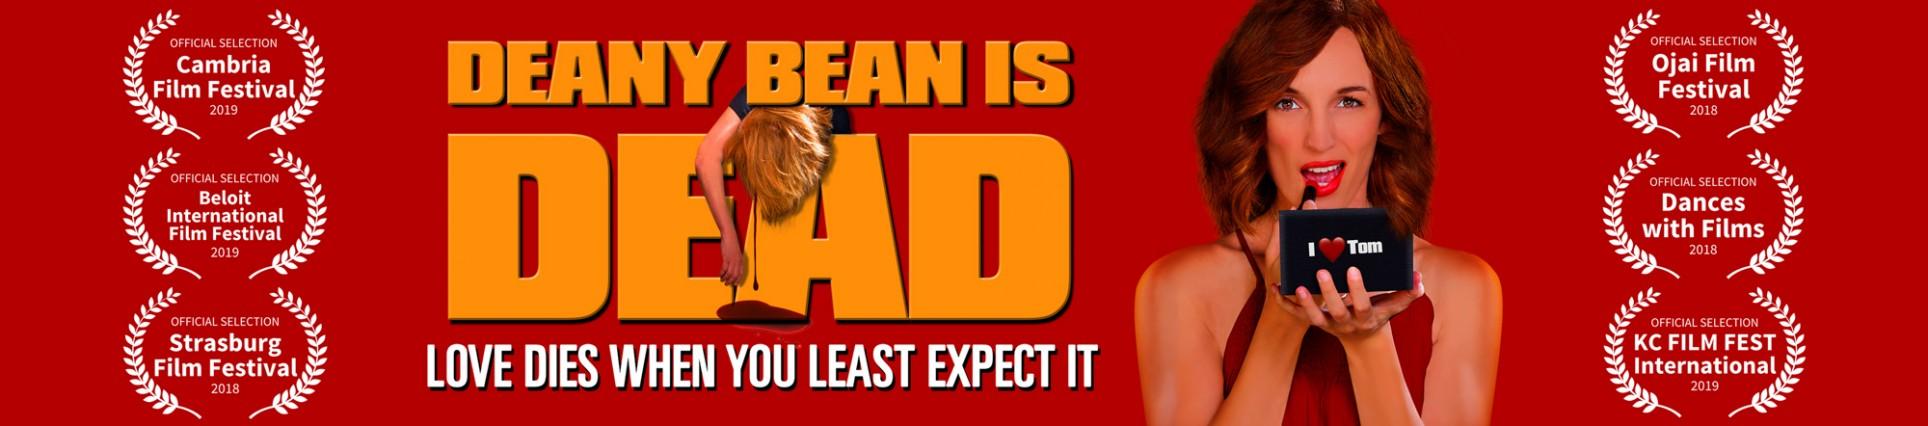 Deany-Bean-Is-Dead_WebBanner